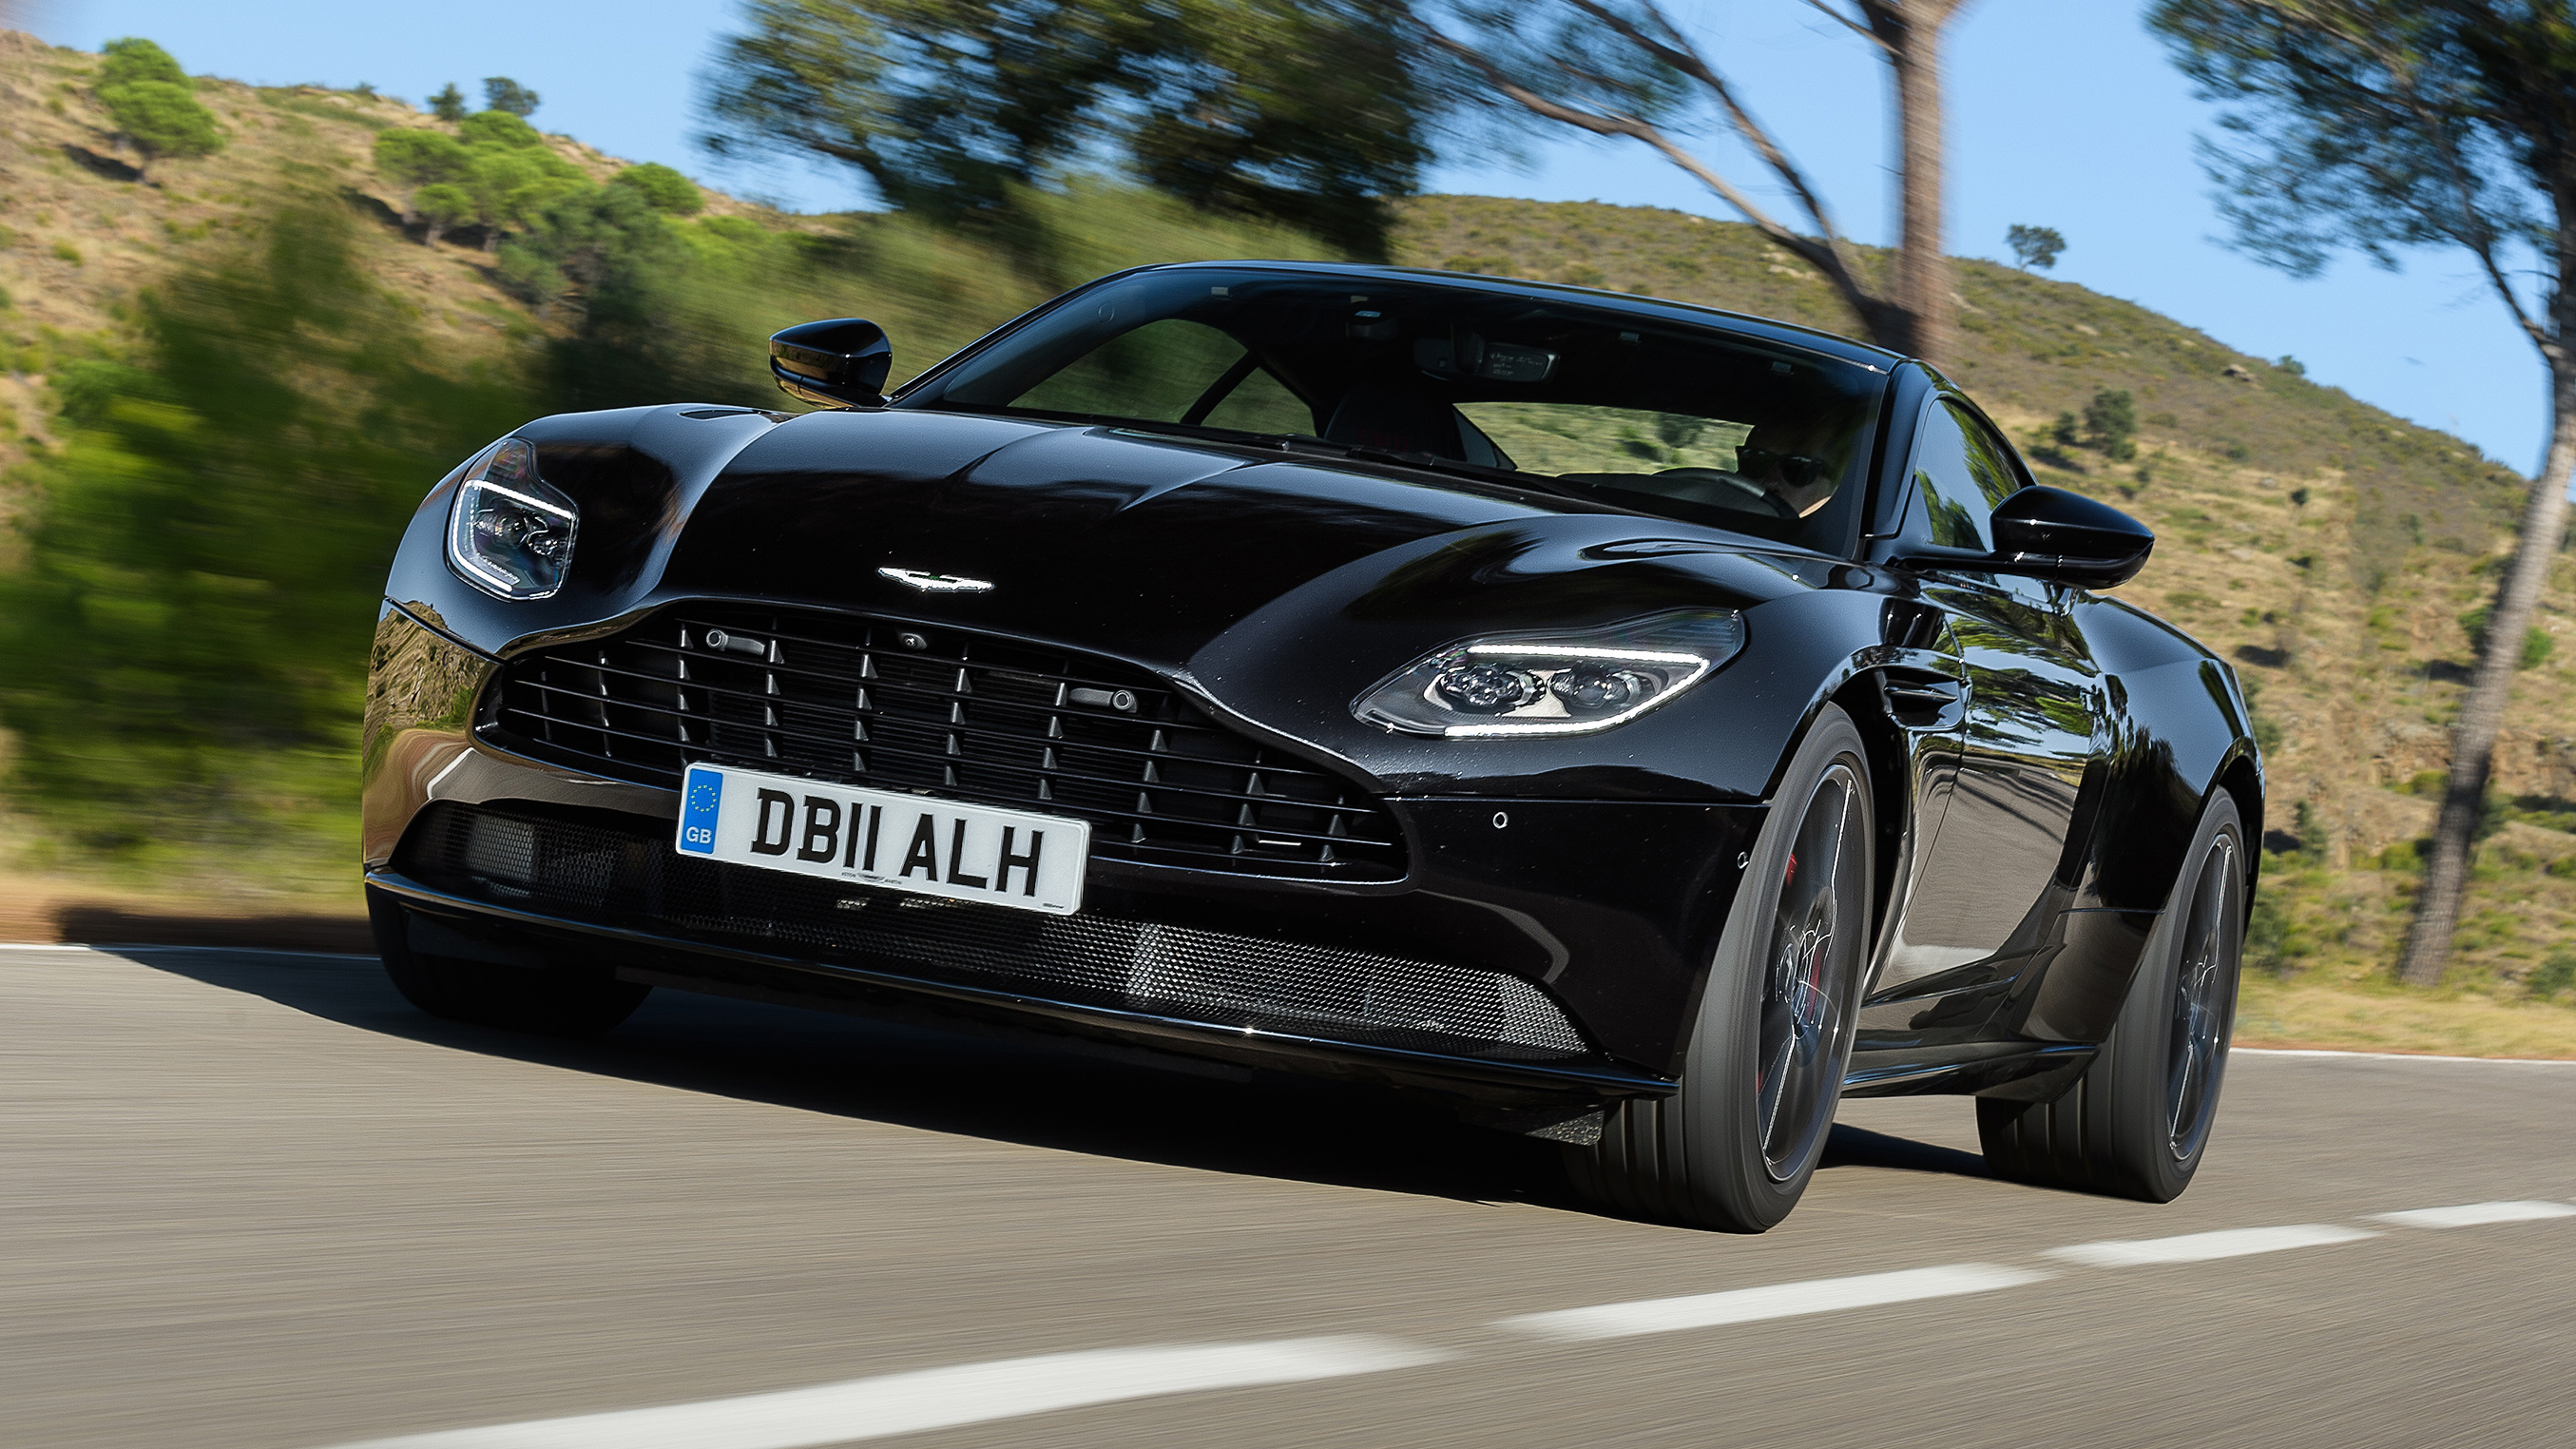 Aston Martin Db11 Review Amg V8 Makes The Db11 Wilder Top Gear